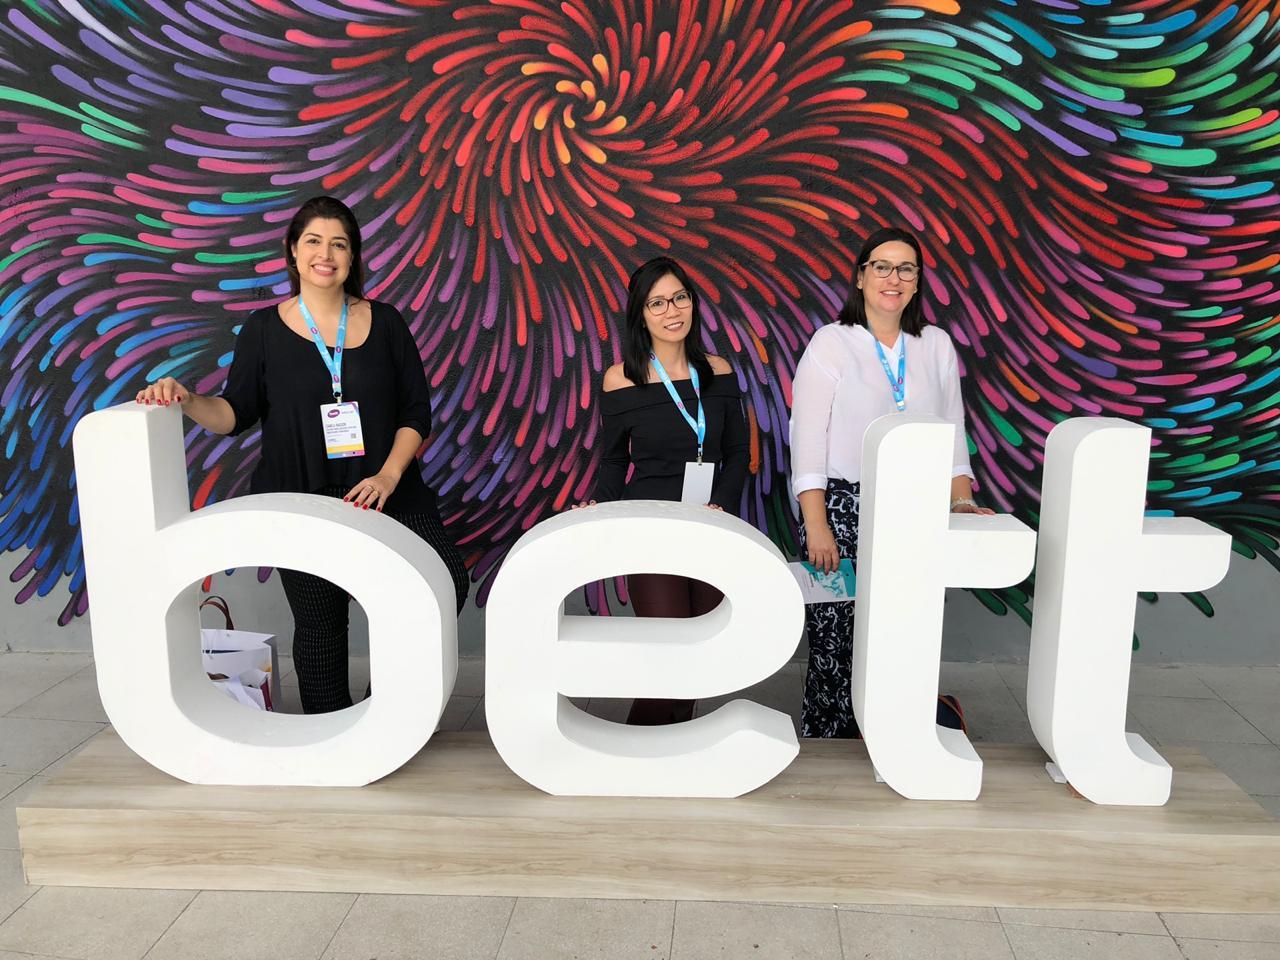 Equipe pedagógica marca presença na Bett Educar